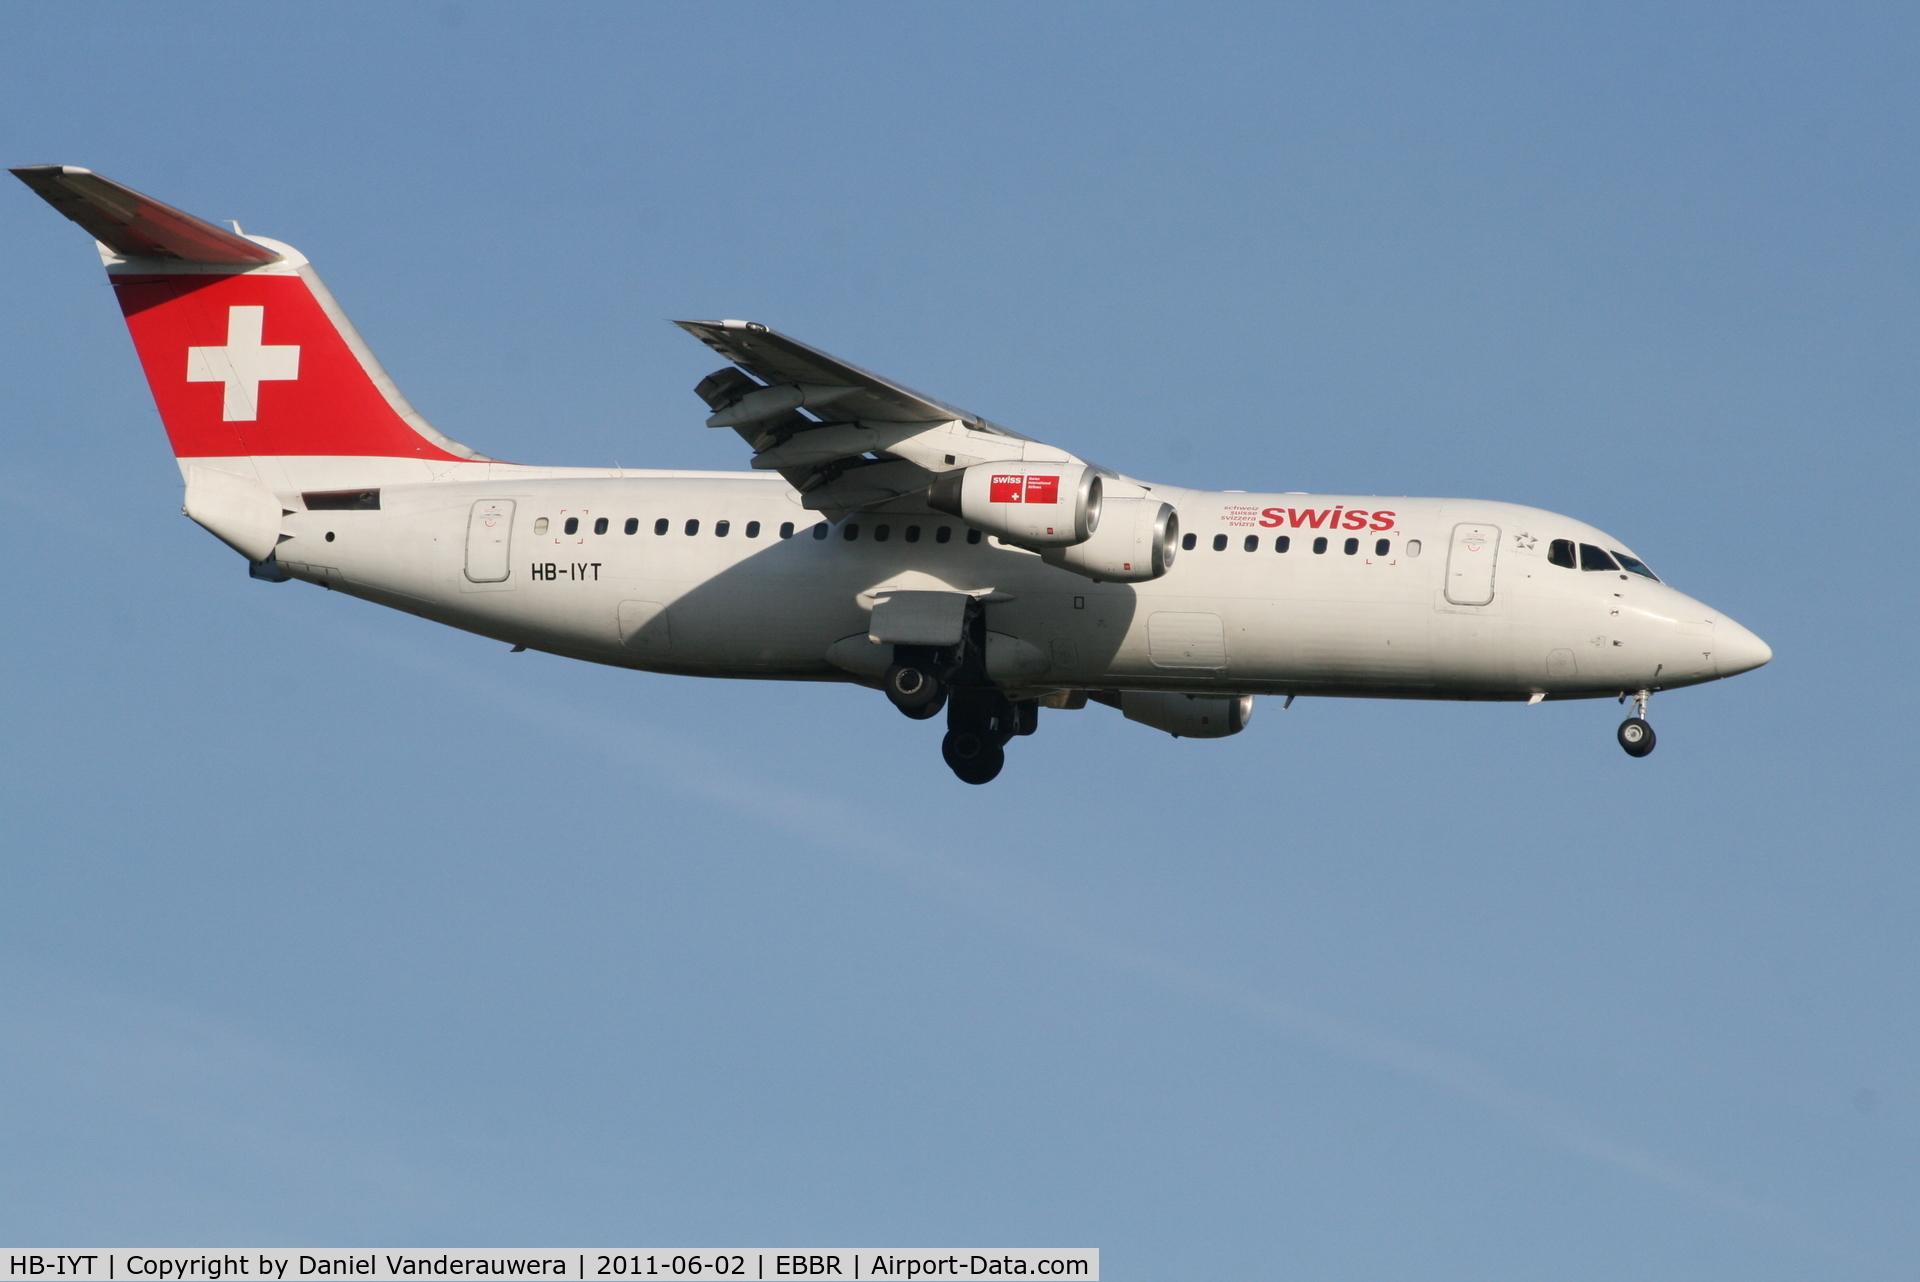 HB-IYT, 2000 British Aerospace Avro 146-RJ100 C/N E3380, Arrival of flight LX760 to RWY 02